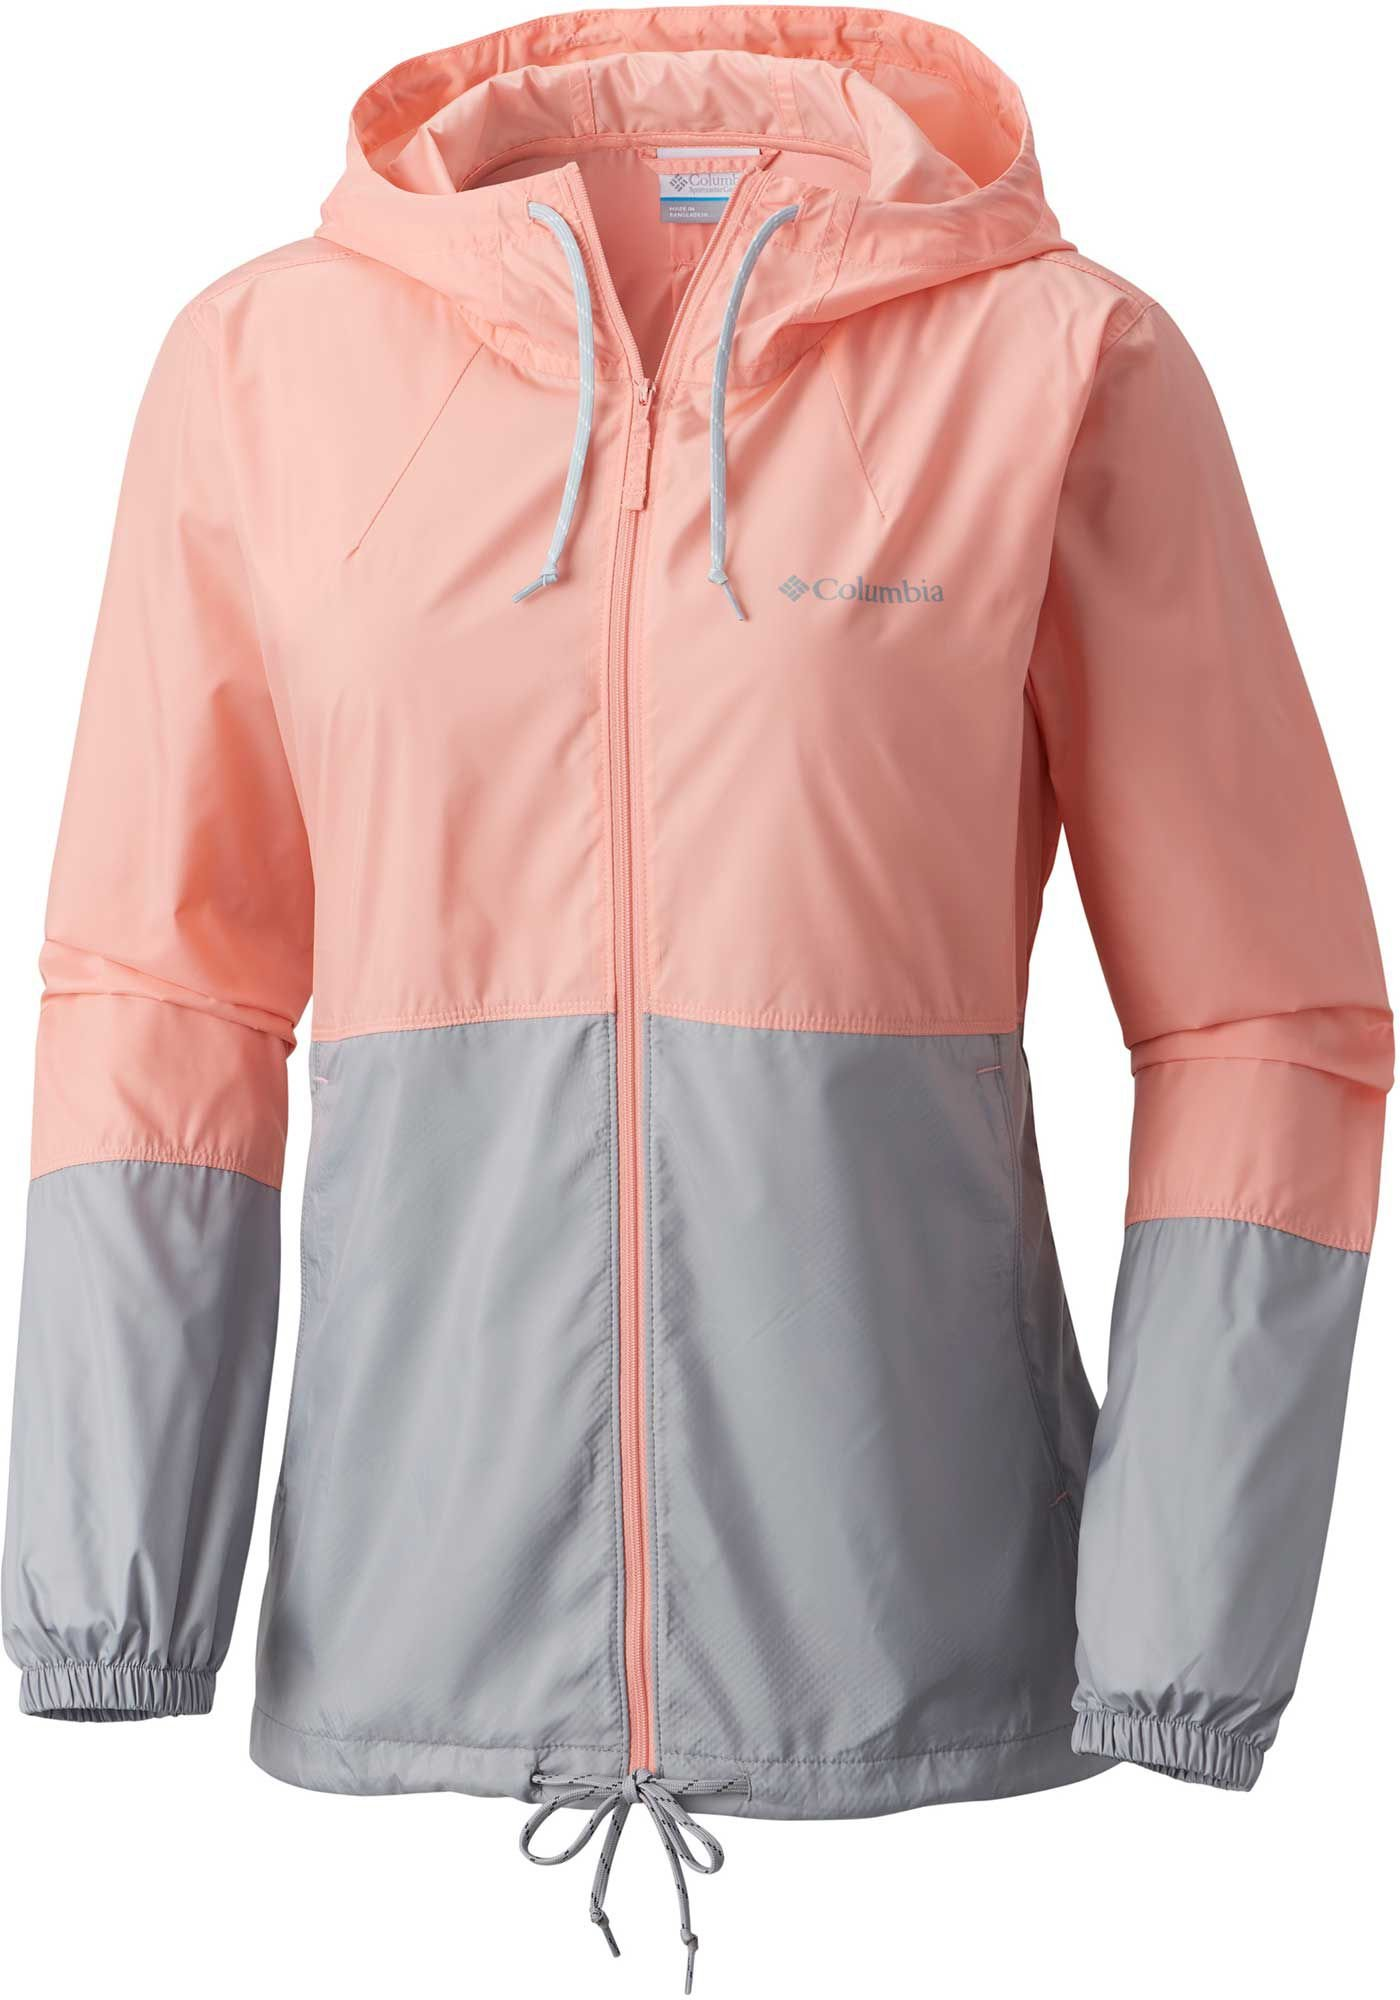 Columbia Women's Plus Size Flash Forward Windbreaker Jacket, Sorbet, Grey, 2X